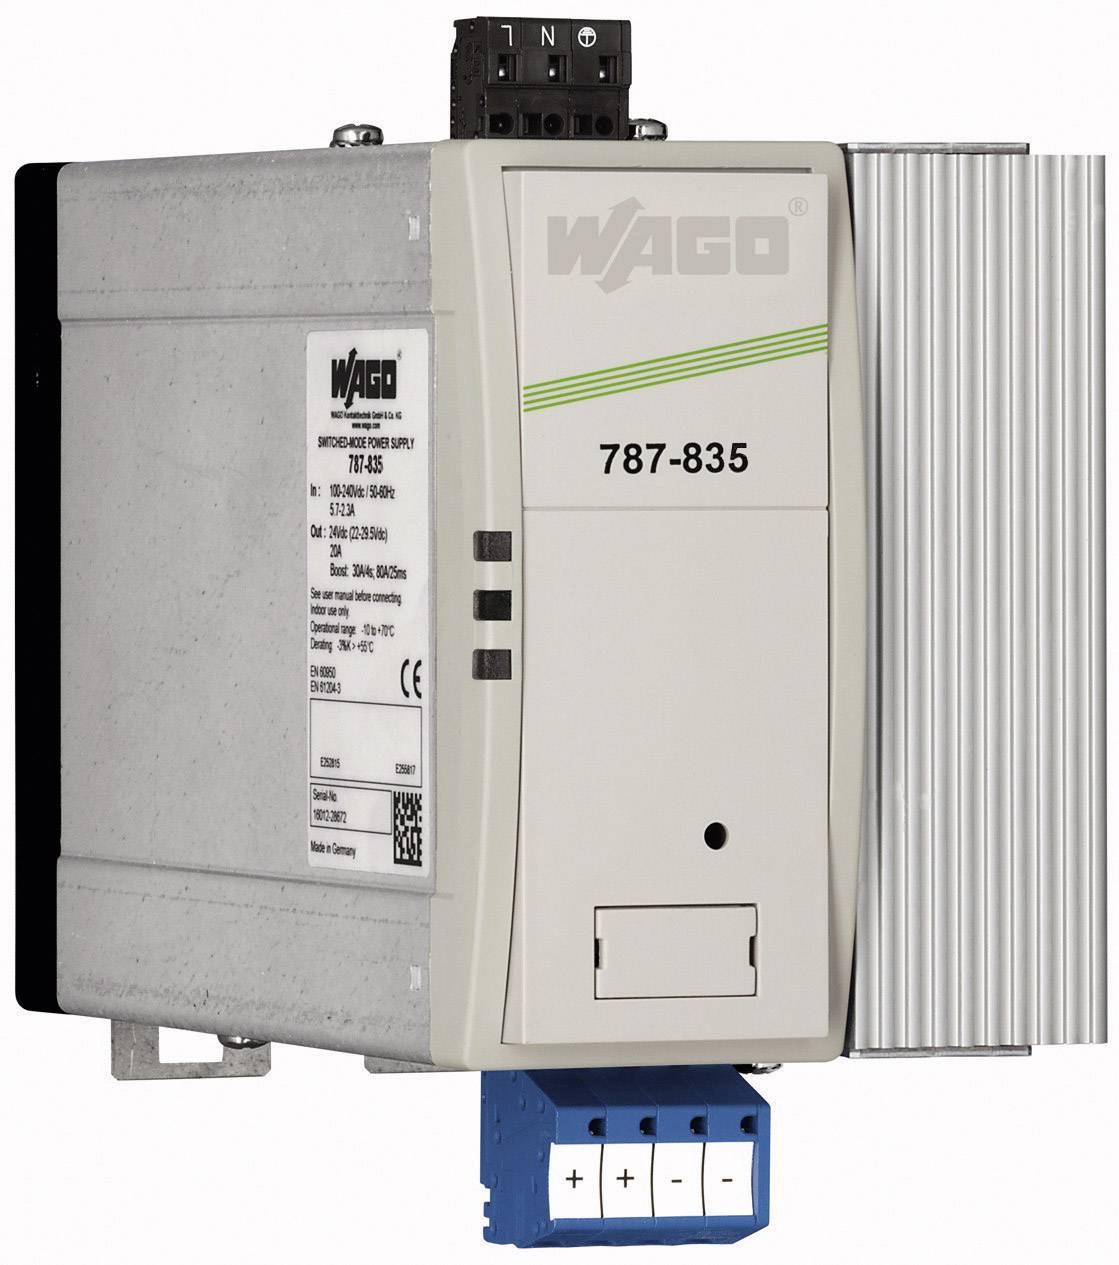 Zdroj na DIN lištu Wago Epsitron PRO Power 787-835, 10 A, 48 V/DC